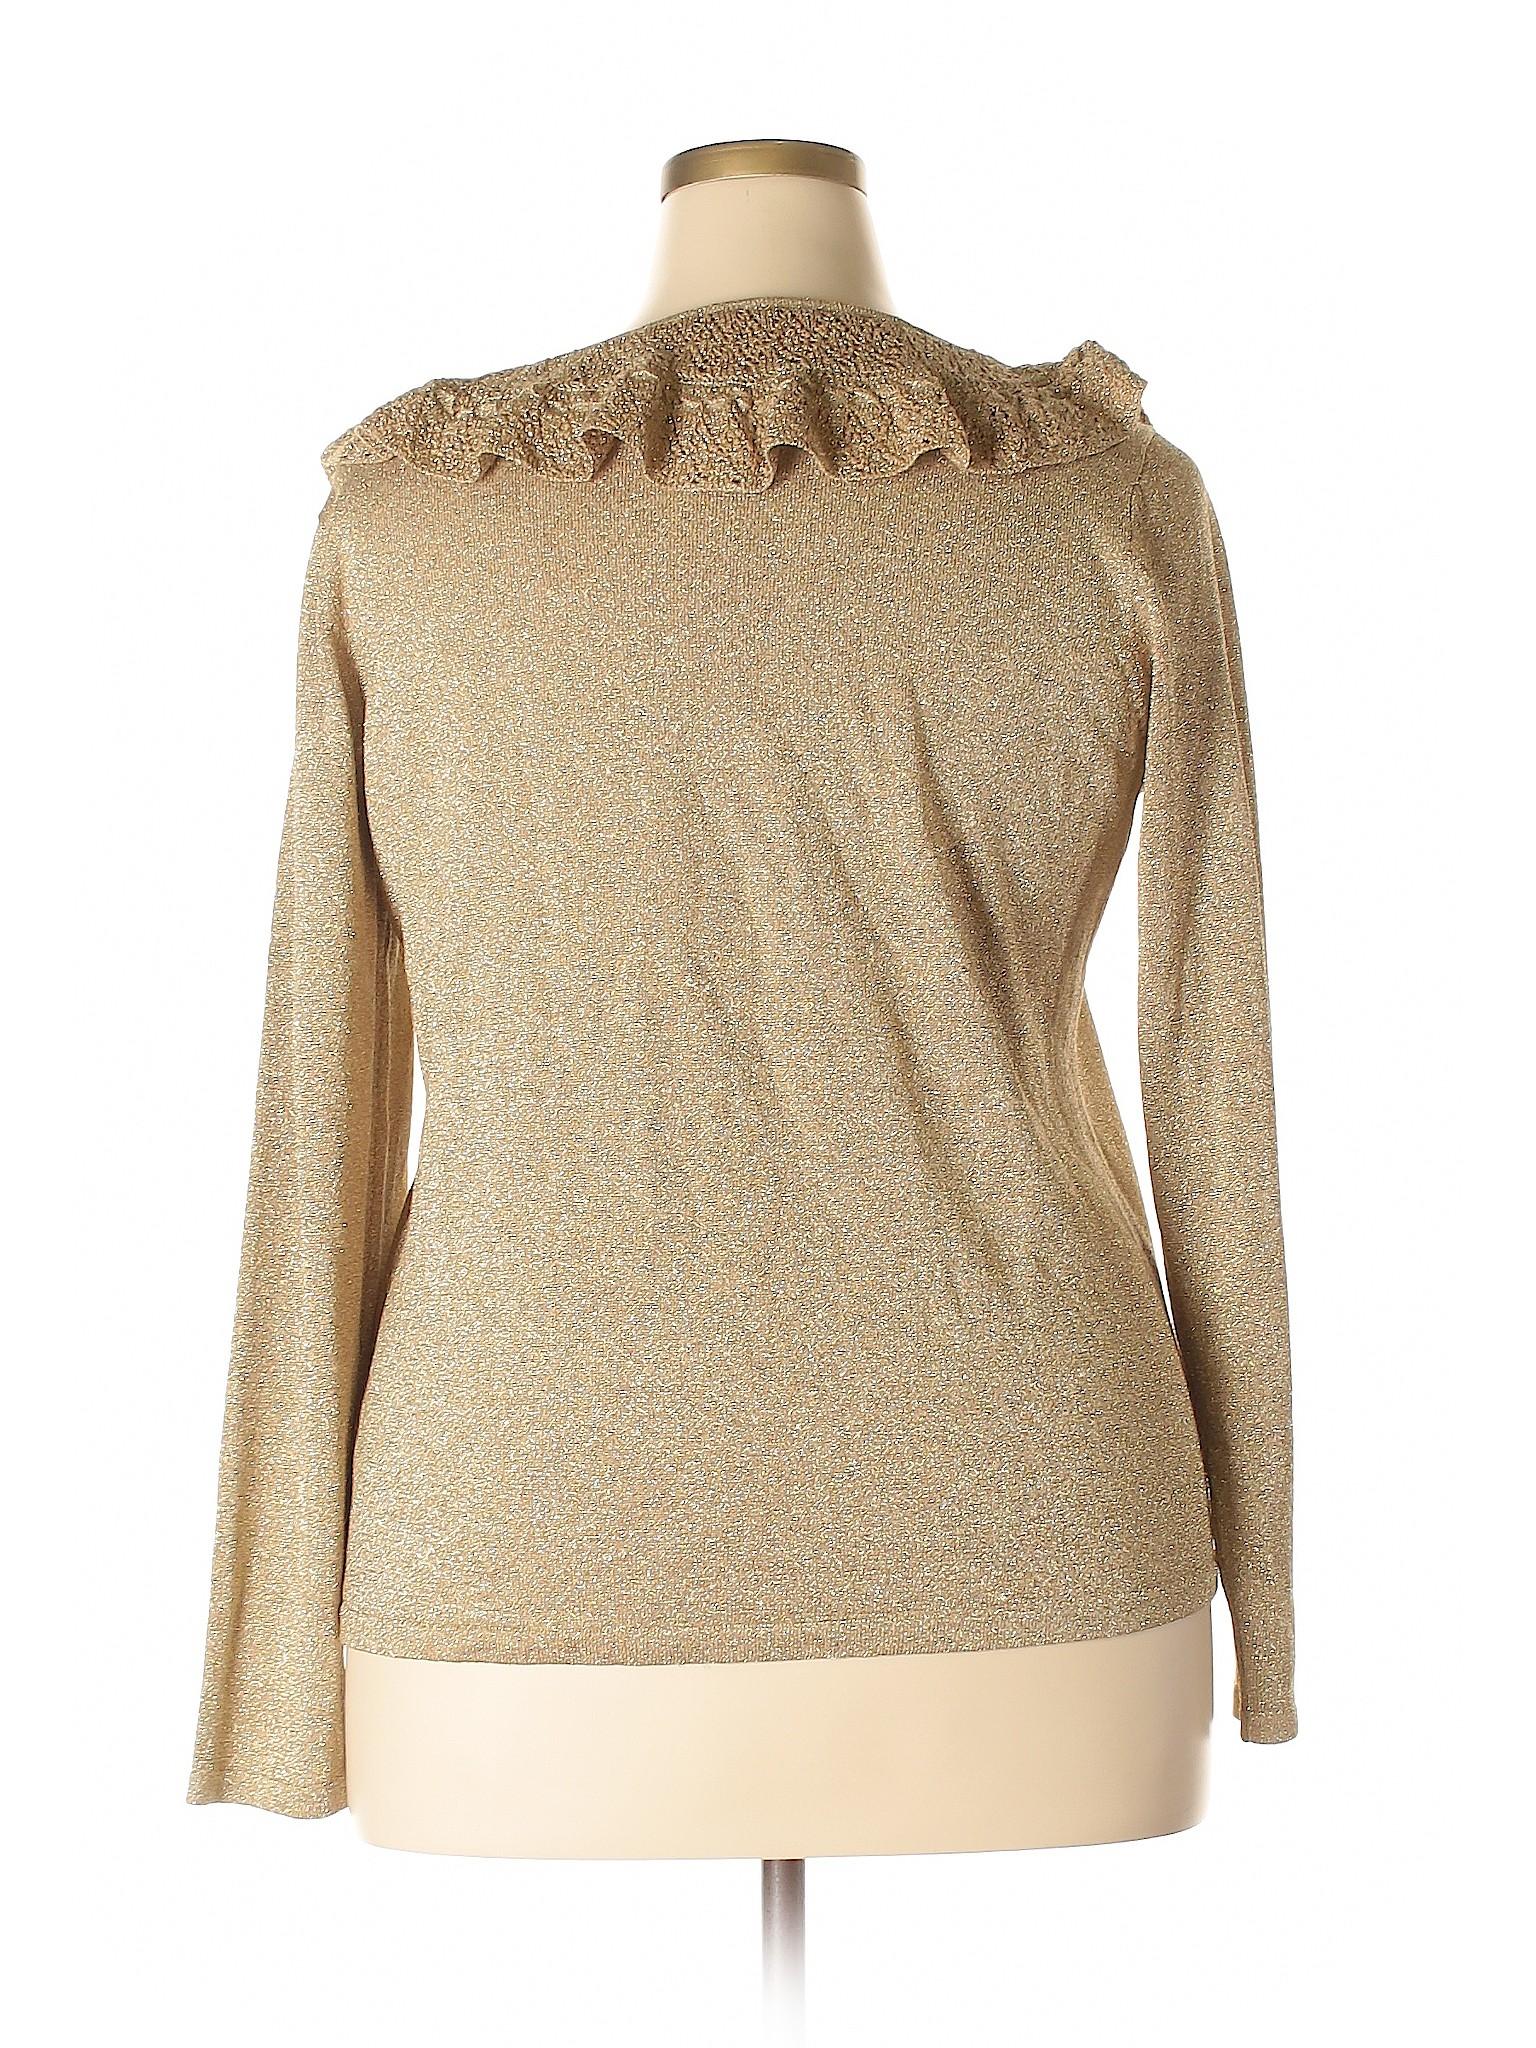 Pullover Lauren by Lauren winter Boutique Sweater Ralph Silk fqc7RyU